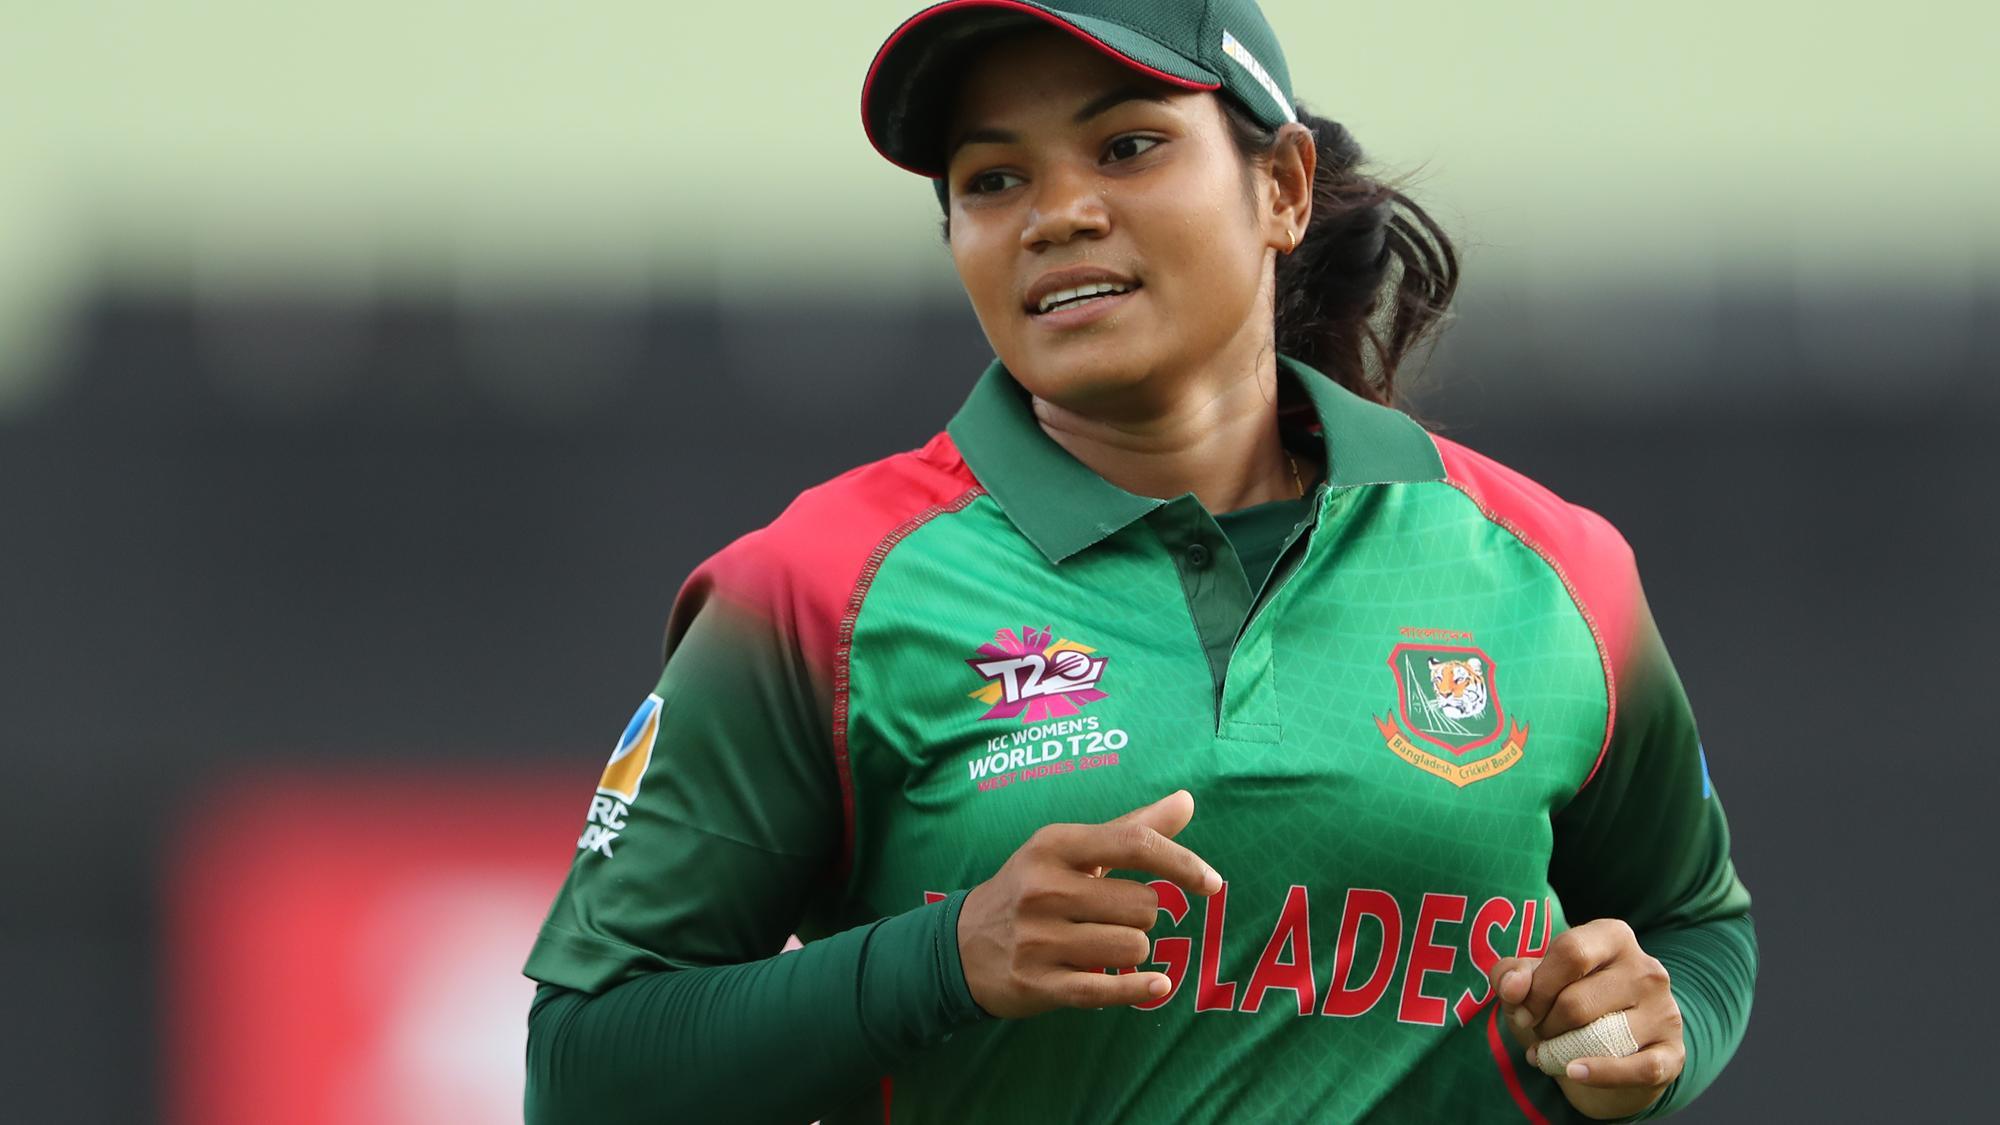 Sanjida Islam of Bangladesh during the ICC Women's World T20 warm up match between Bangladesh and Ireland on November 4, 2018 at the Guyana National Stadium in Providence, Guyana.